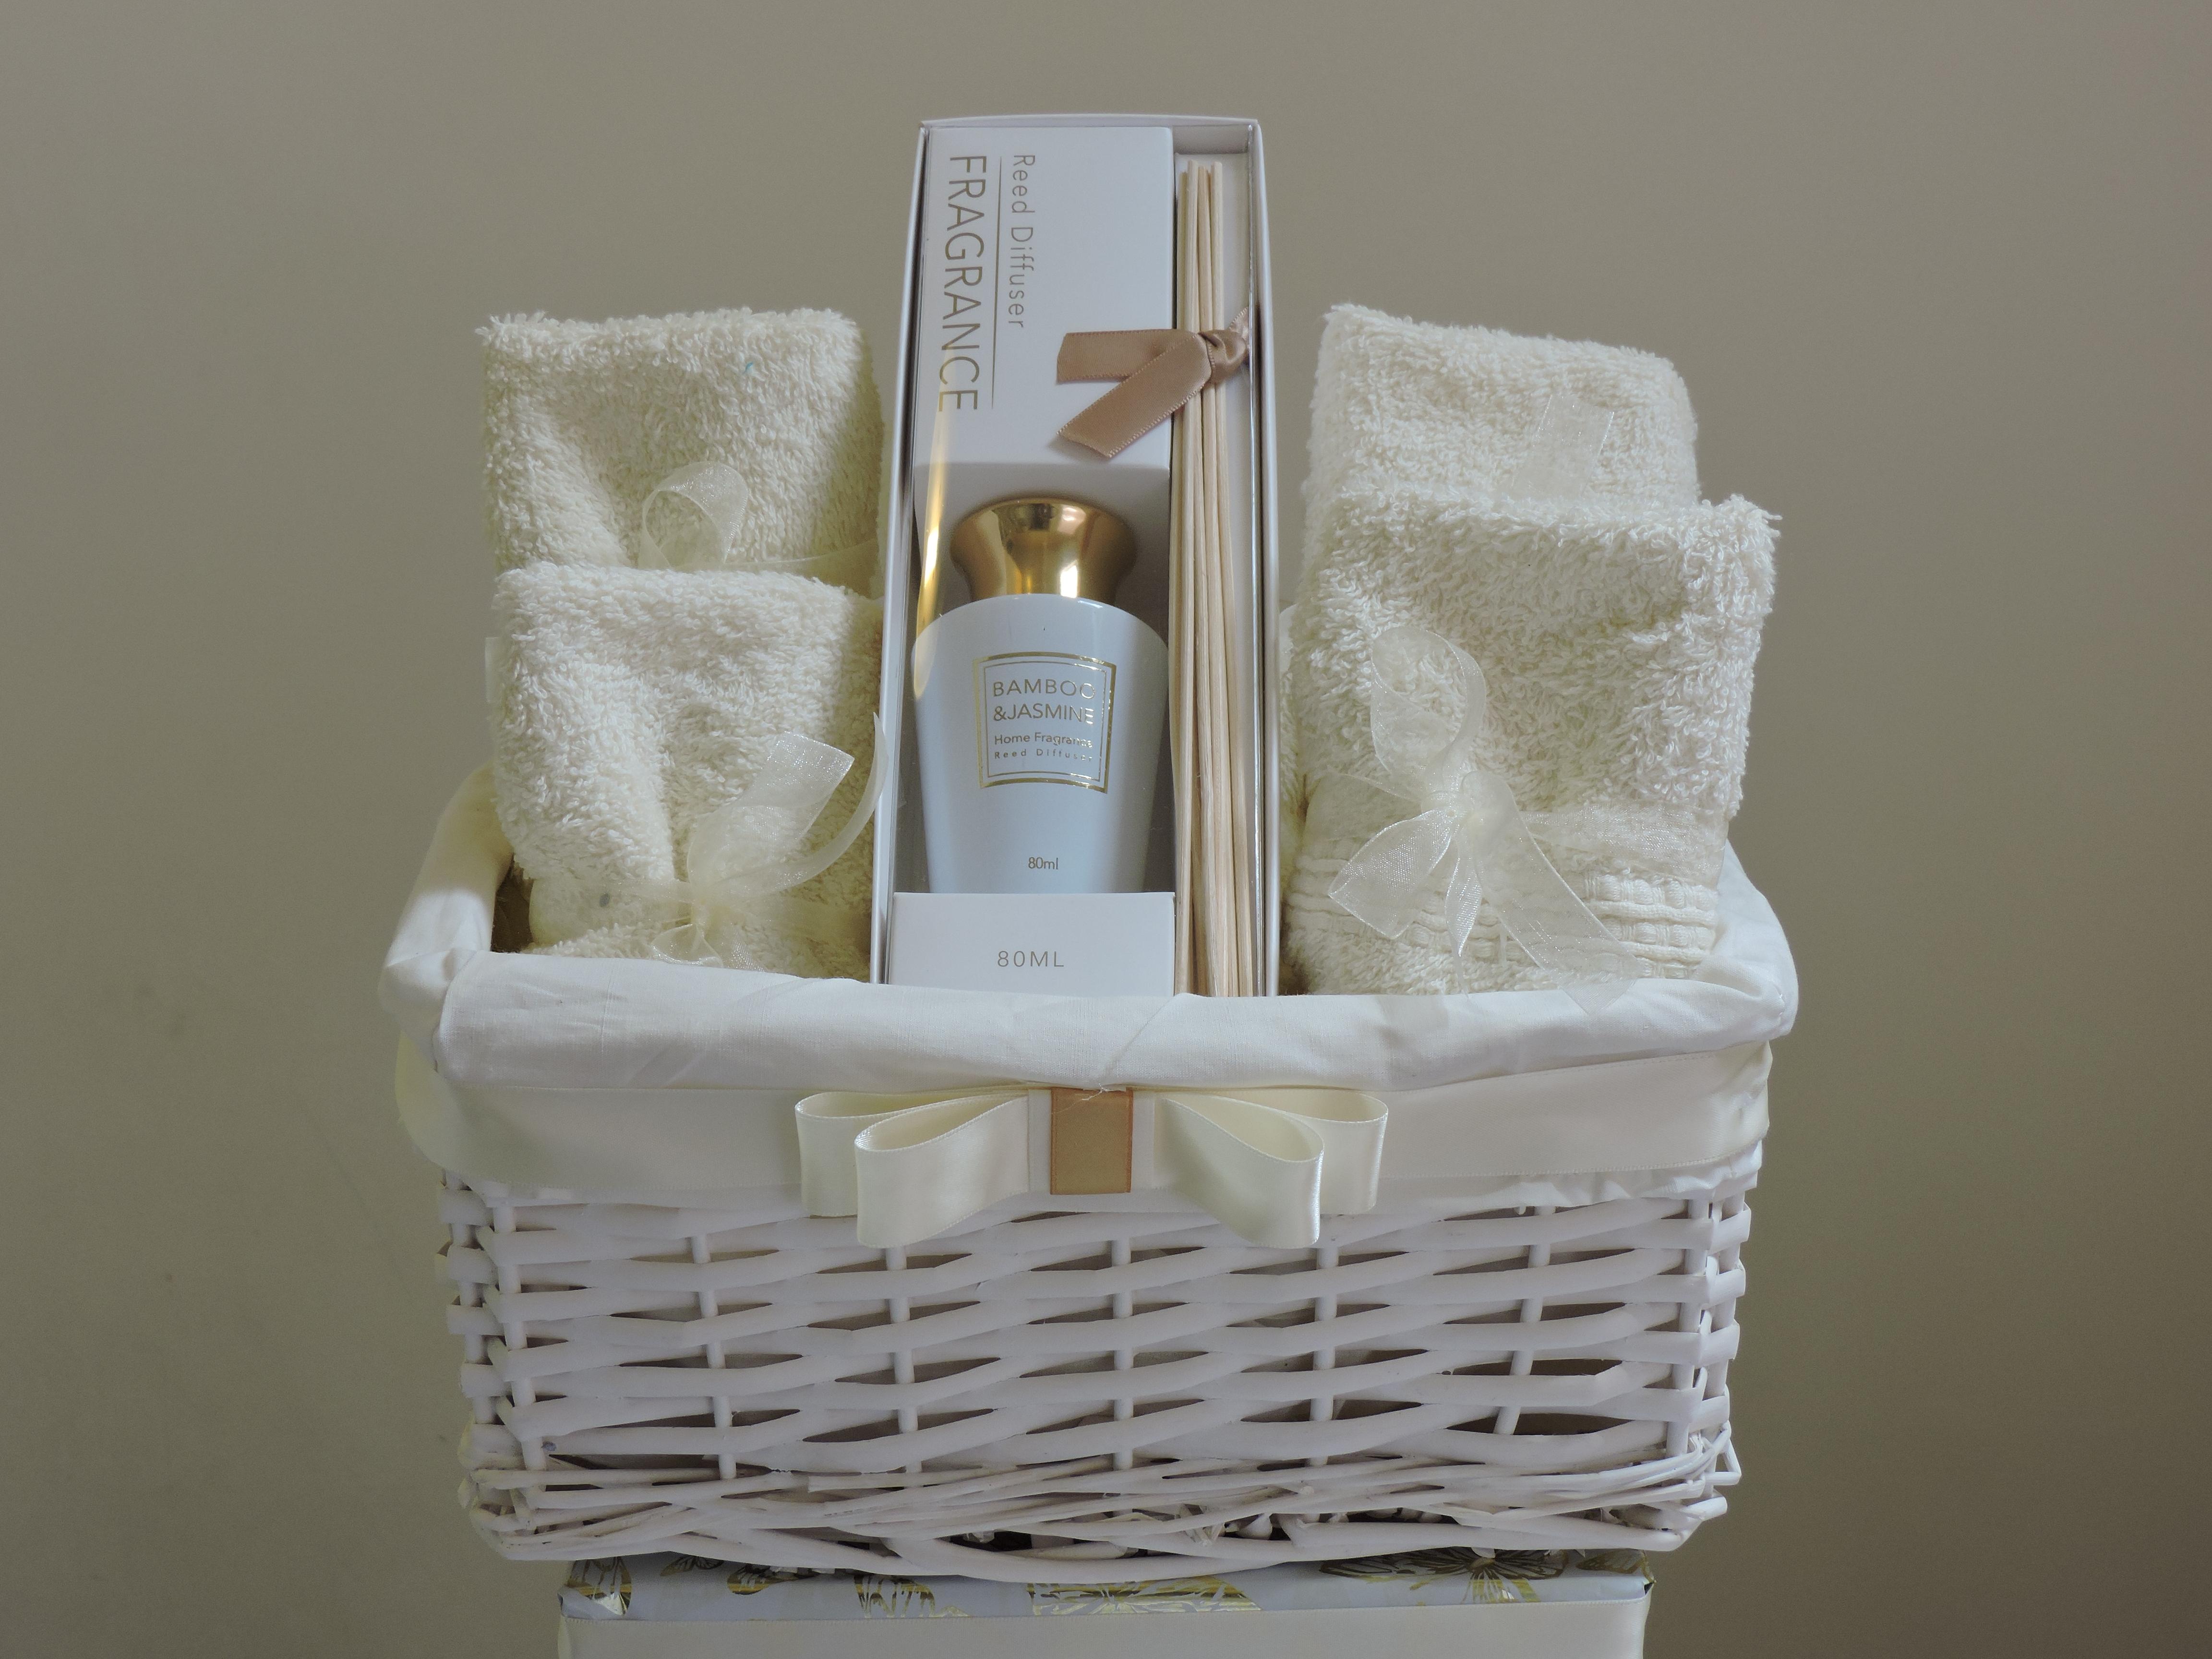 Diffuser & Towel Gift